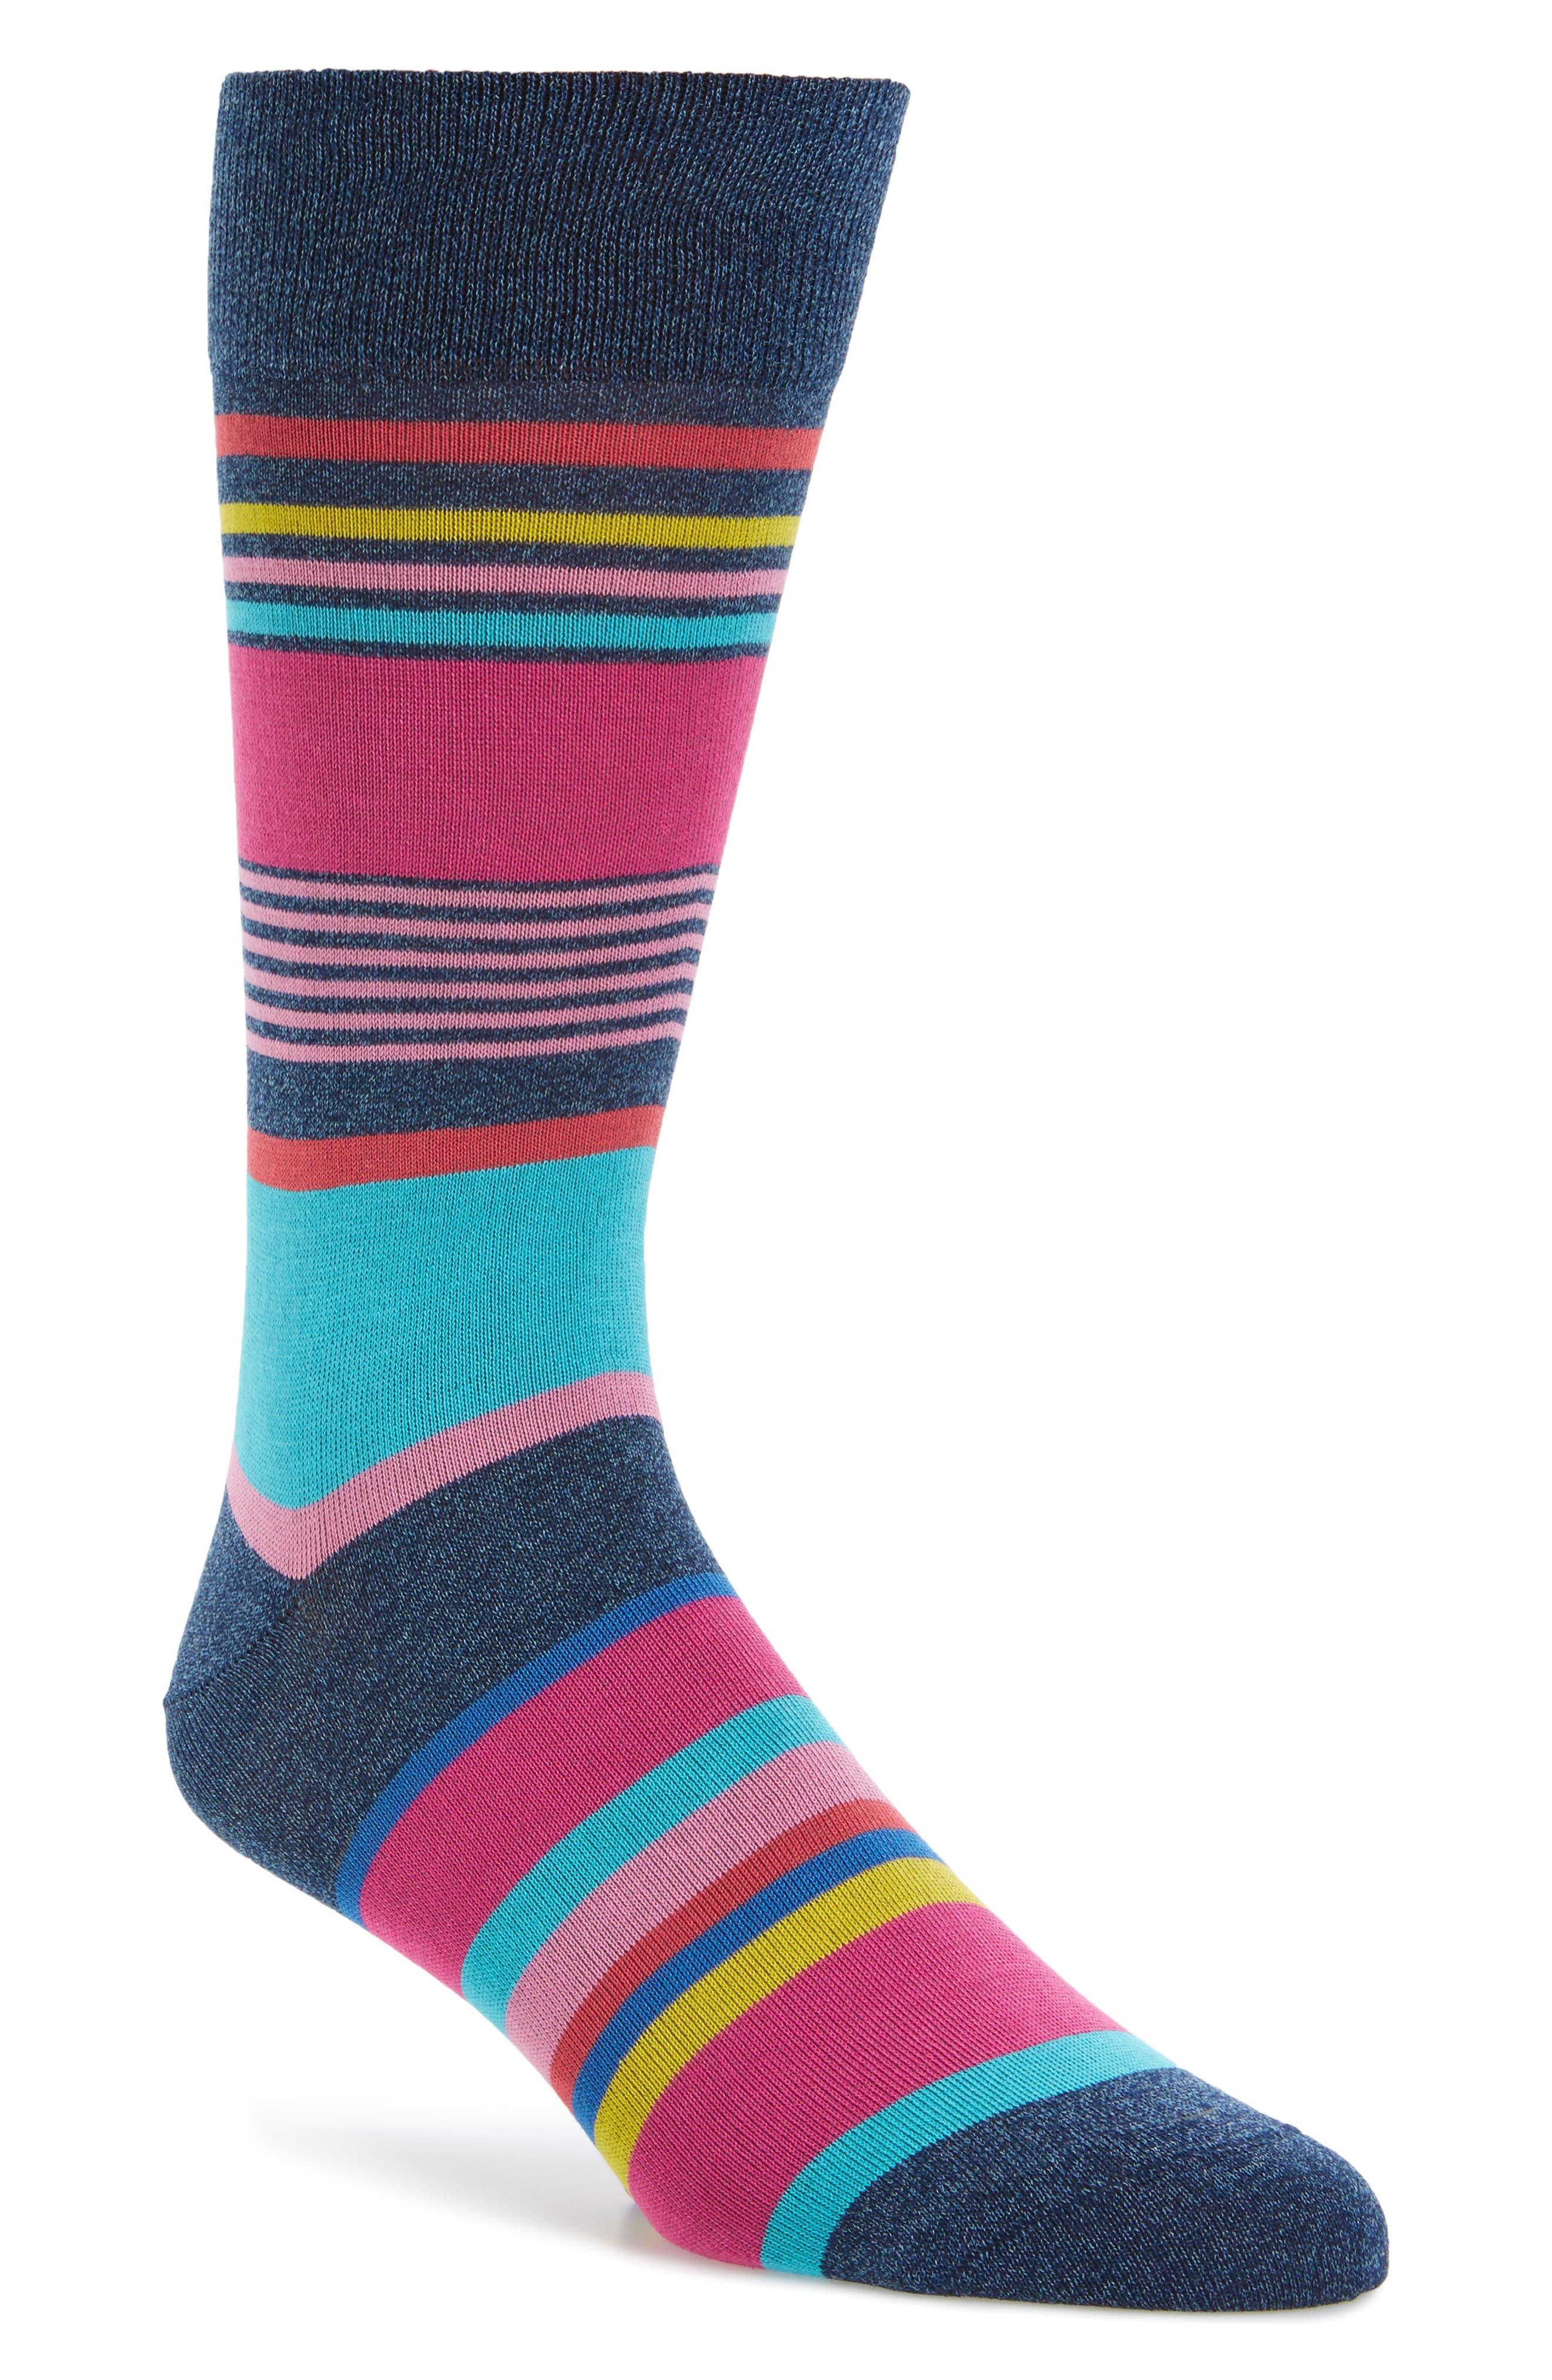 Stripe Socks,                         Main,                         color, Denim/ Pink